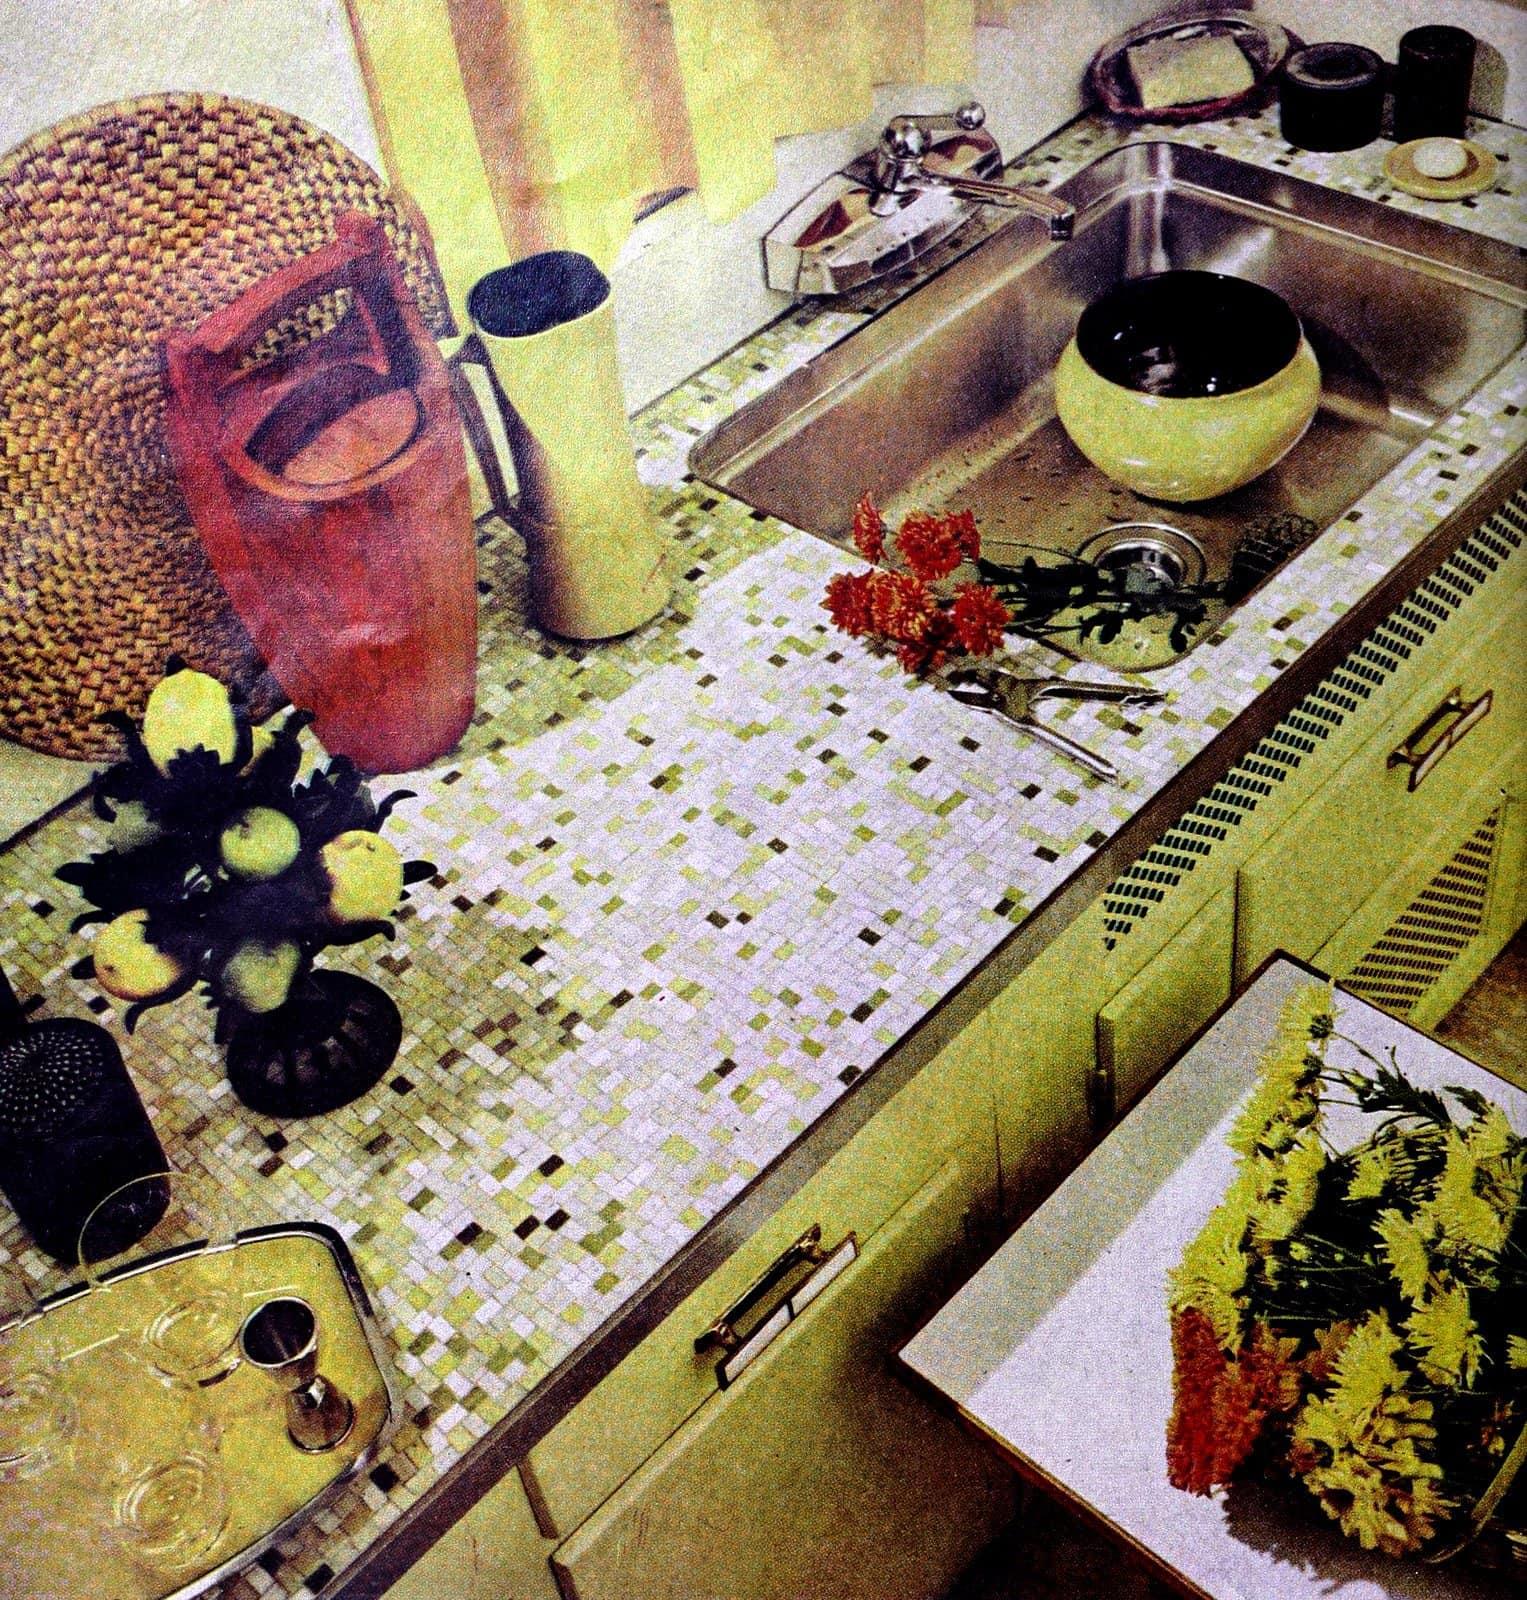 Tiny ceramic tile random mosaic pattern idea for a kitchen (1960)